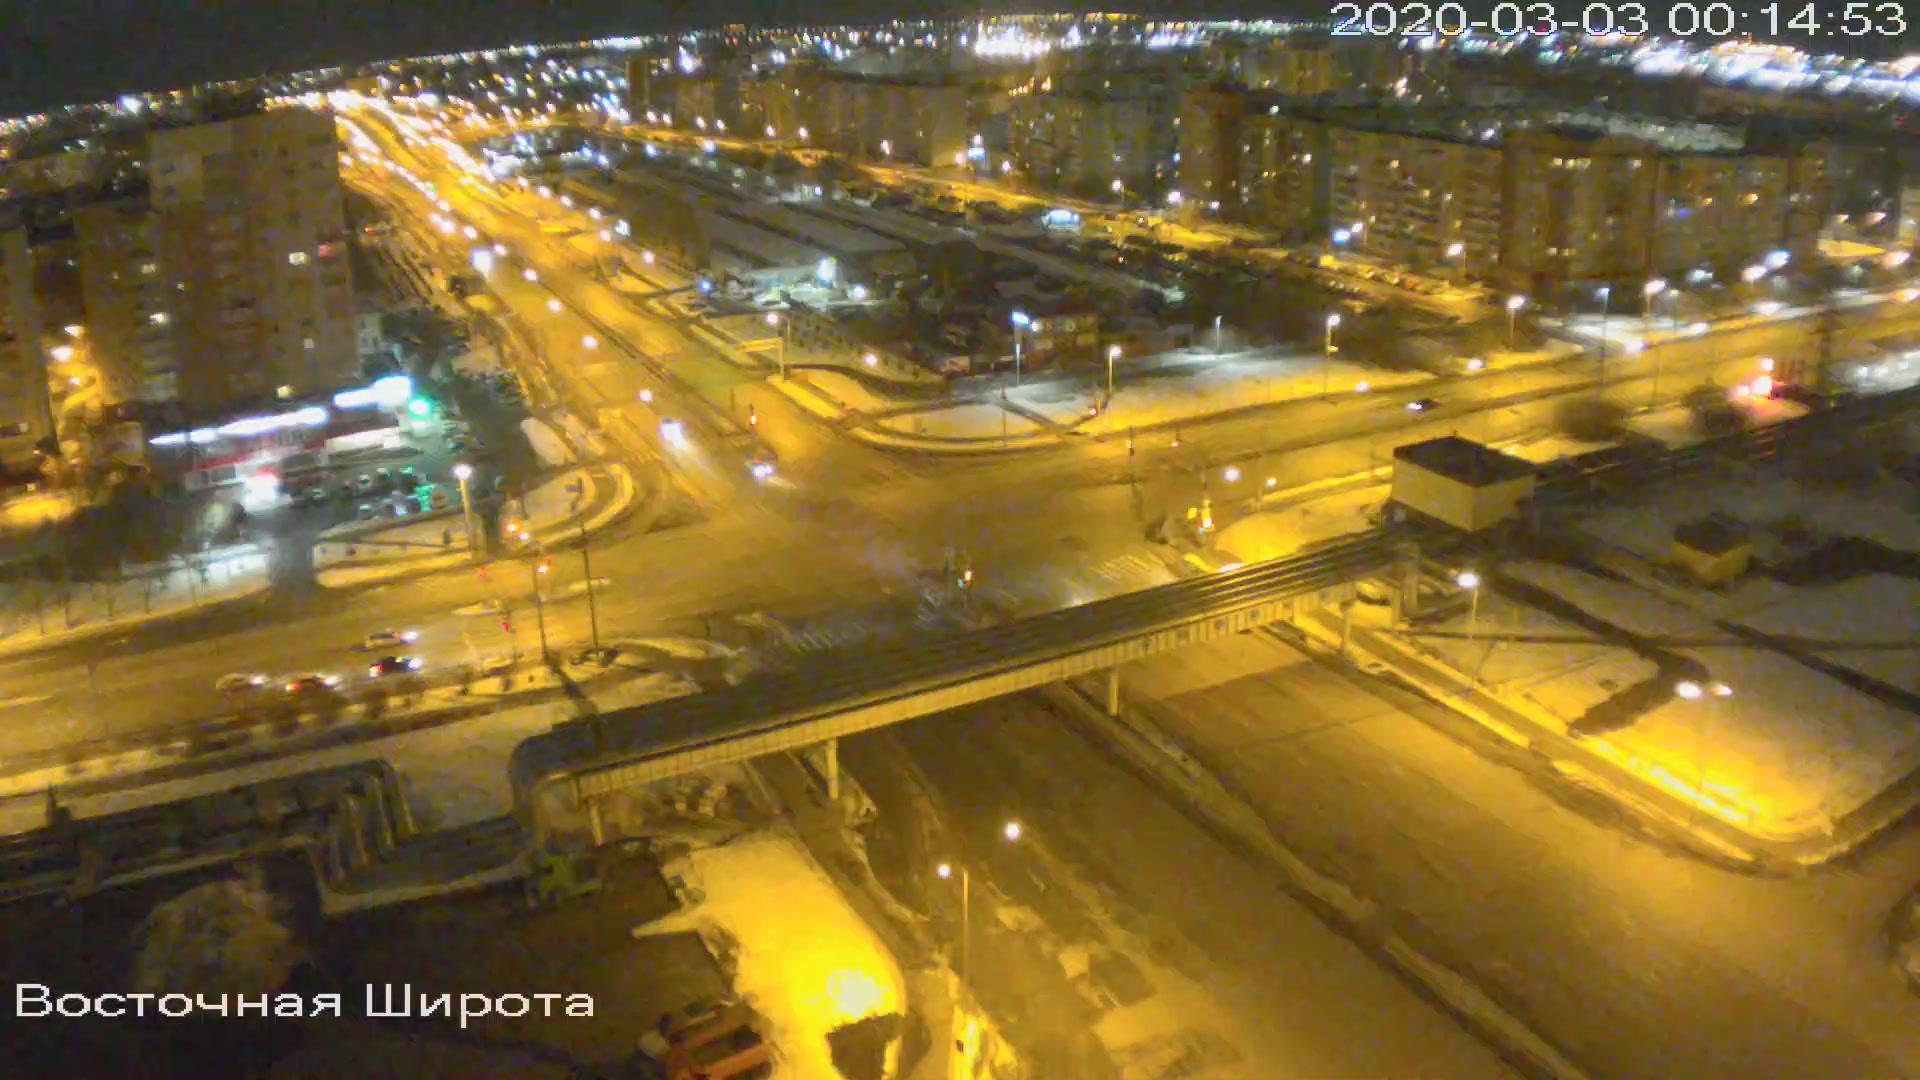 Webkamera Tyumen: Восточная Широта